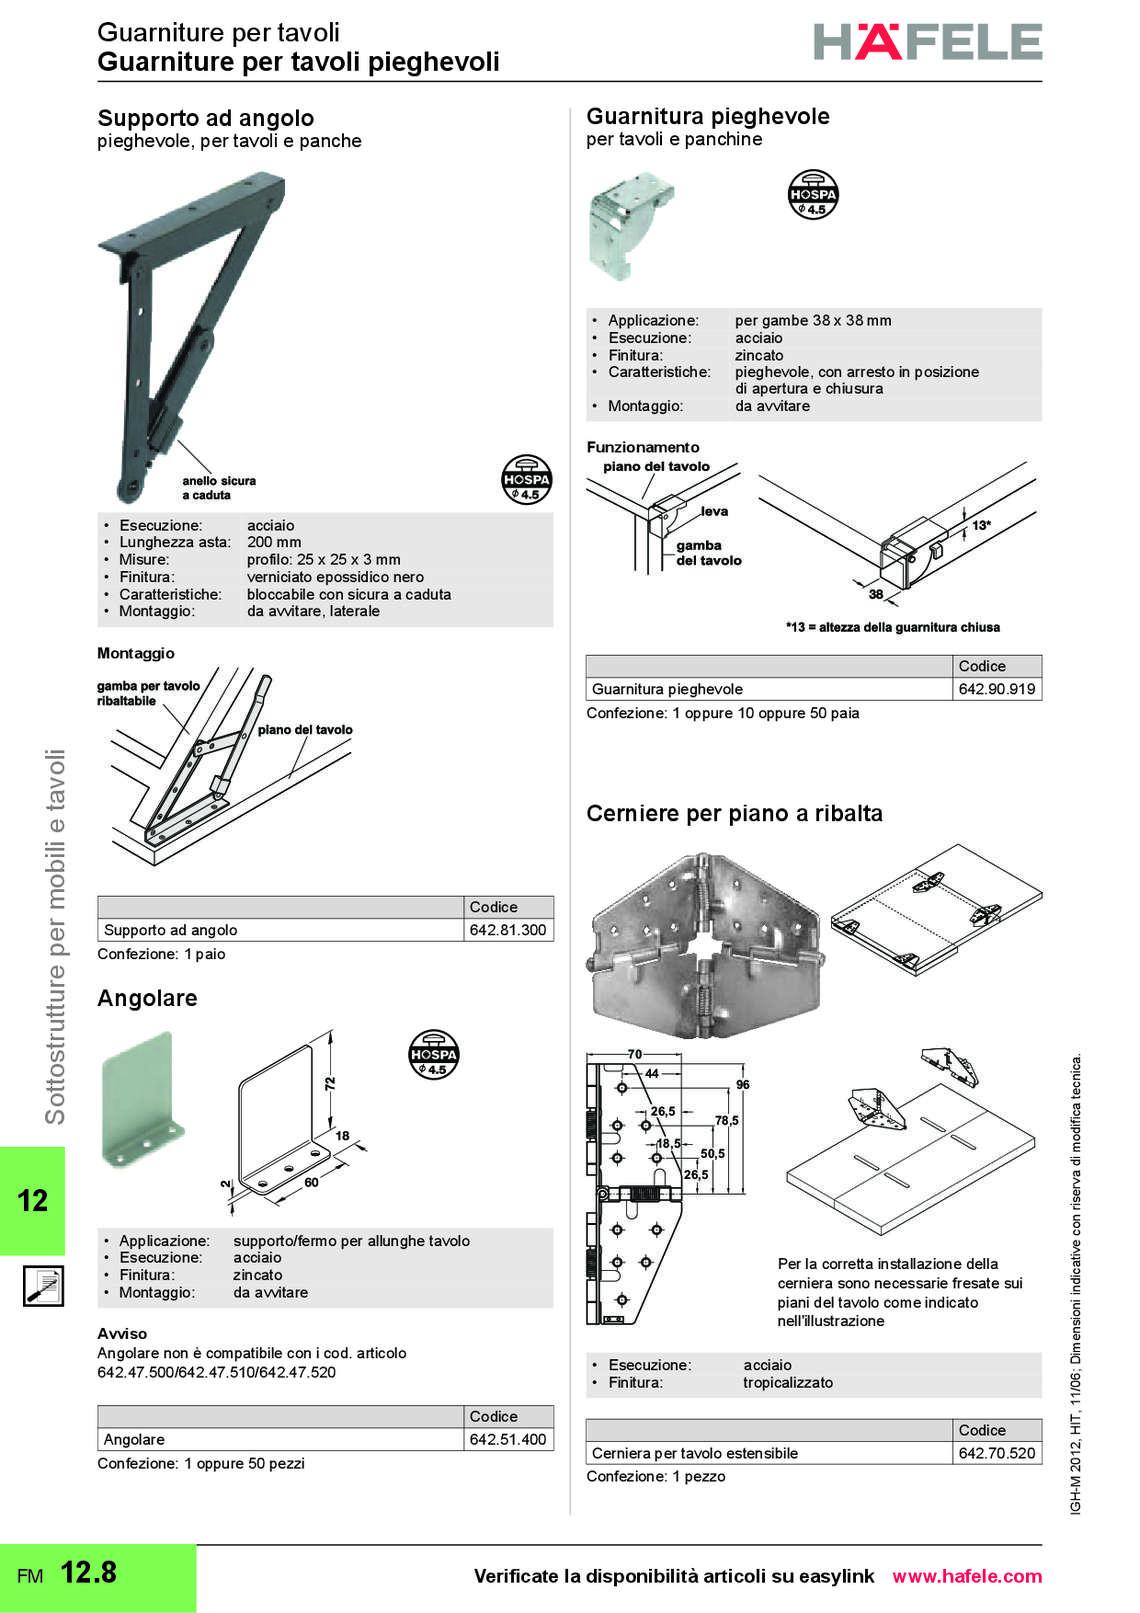 hafele-sottostrutture-per-mobili_83_017.jpg